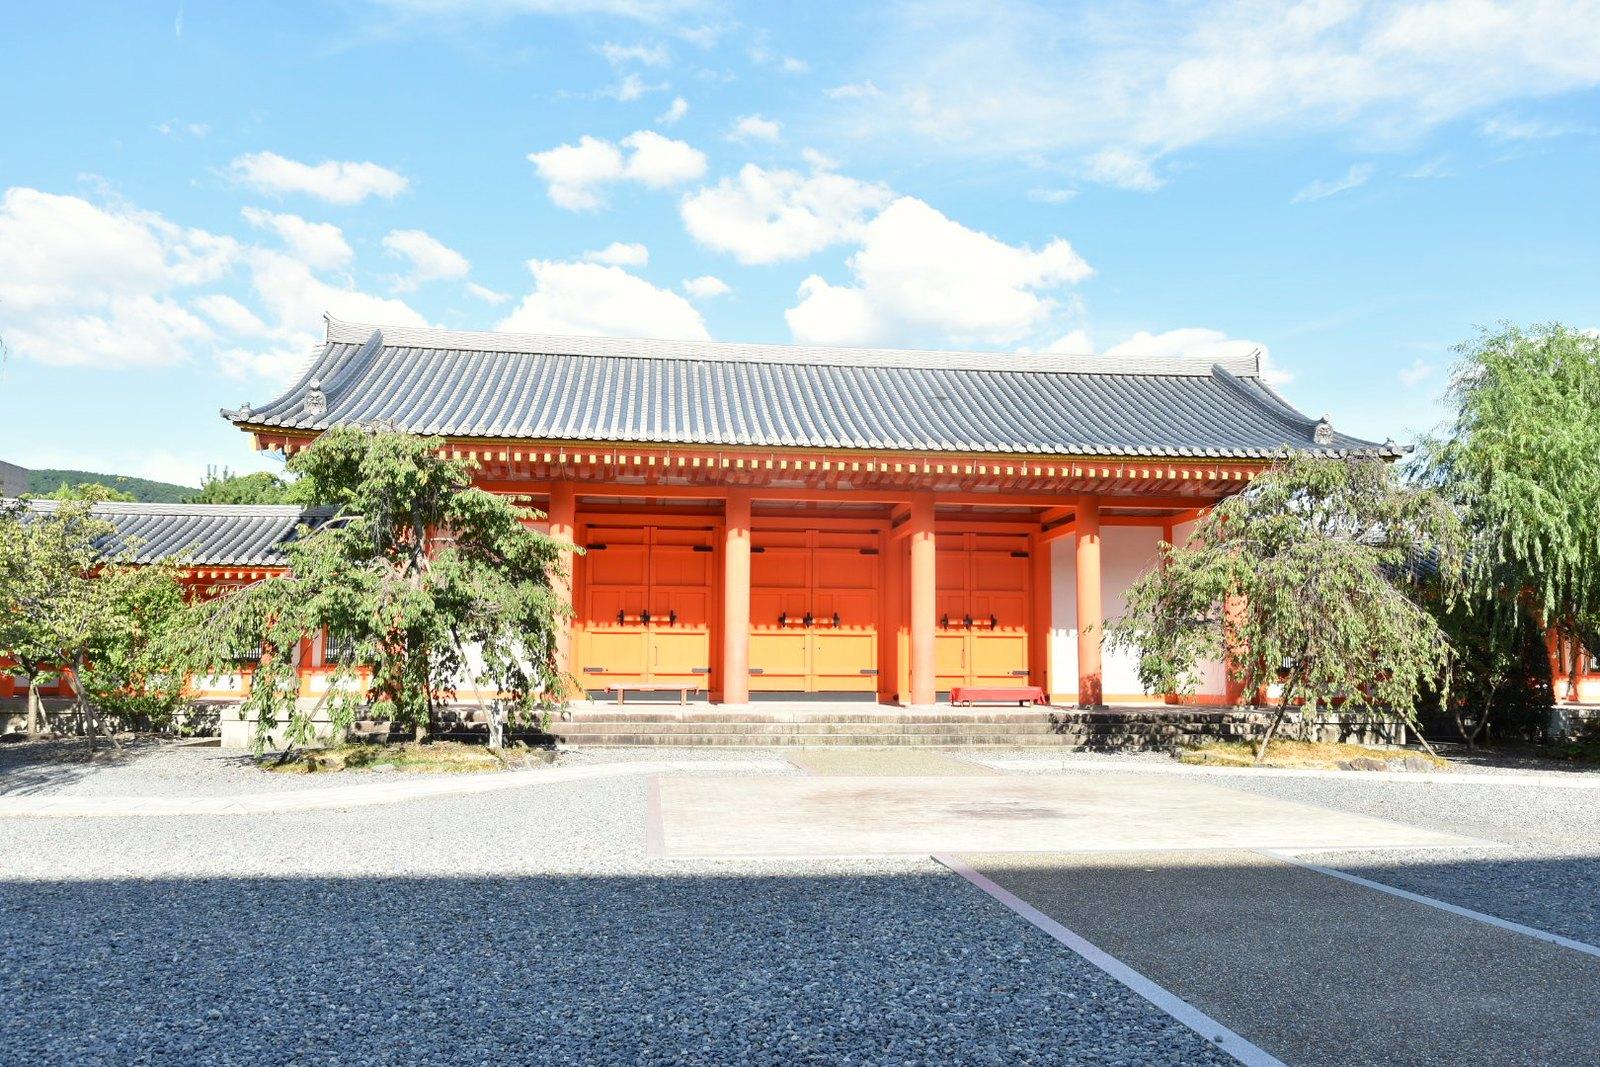 Kyôtô - temple Sanjûsangen-dô